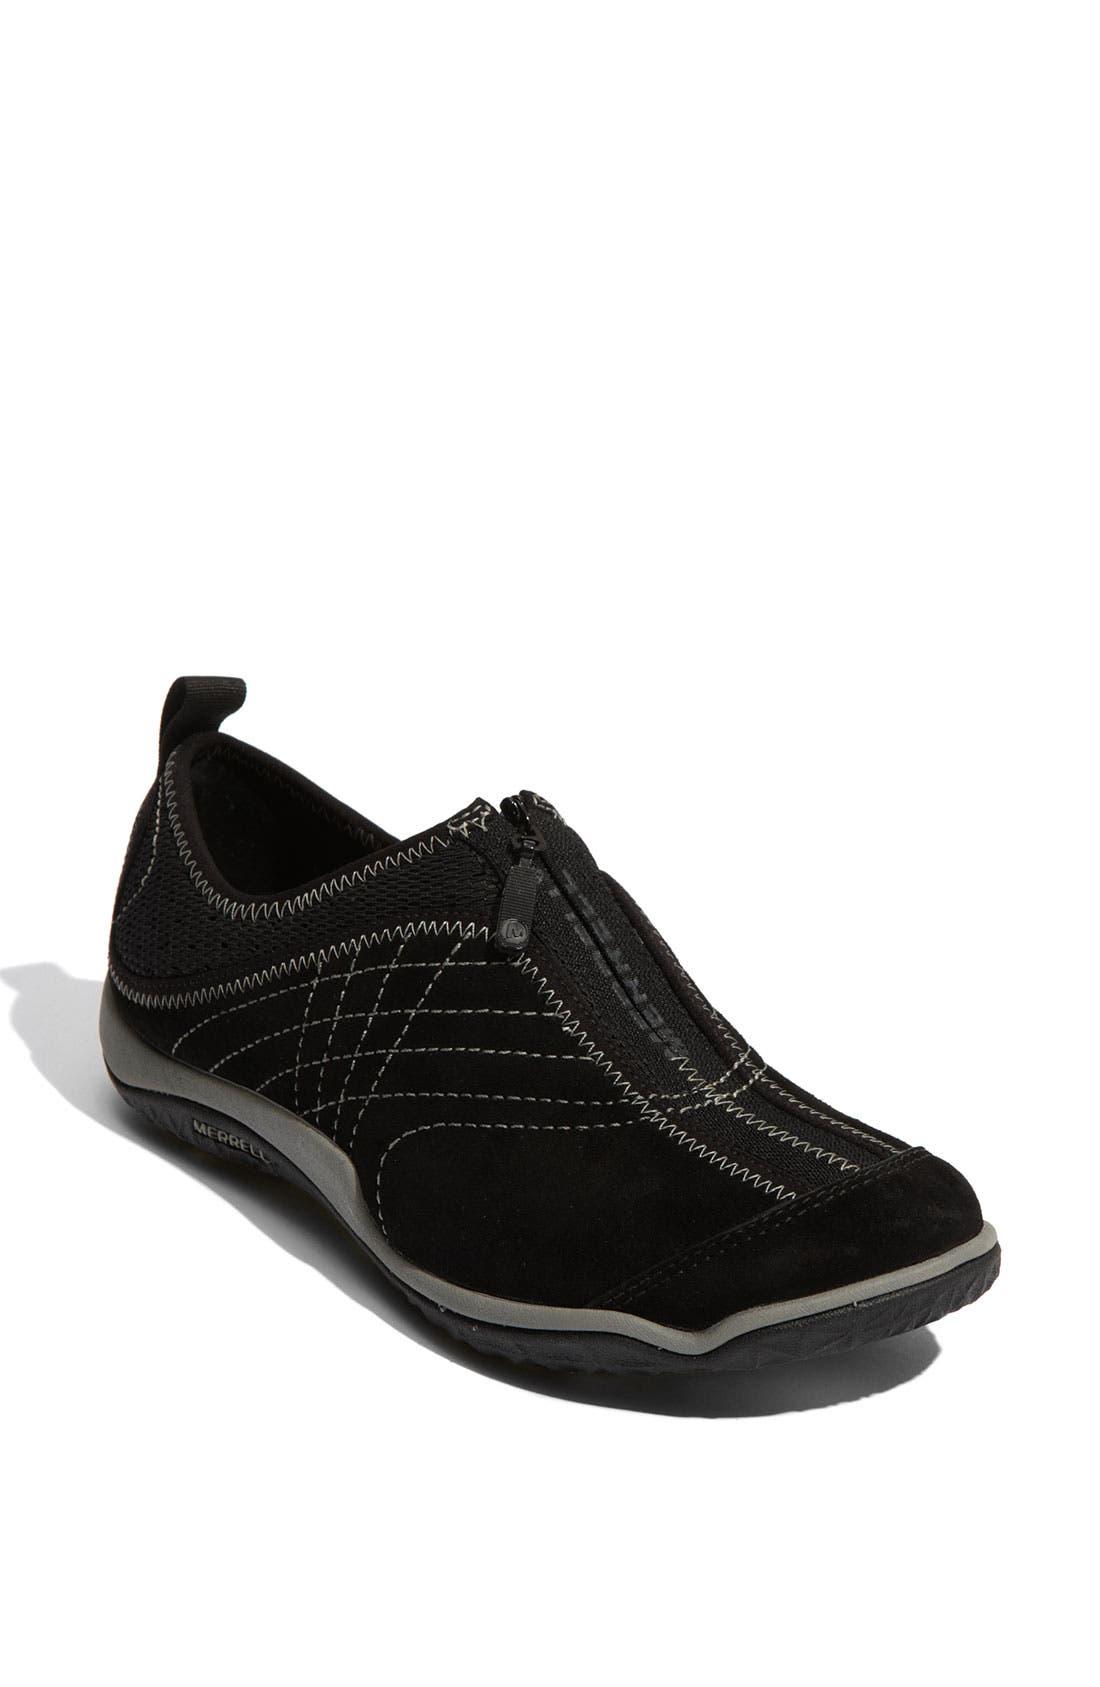 Main Image - Merrell 'Lorelei Zip' Sneaker